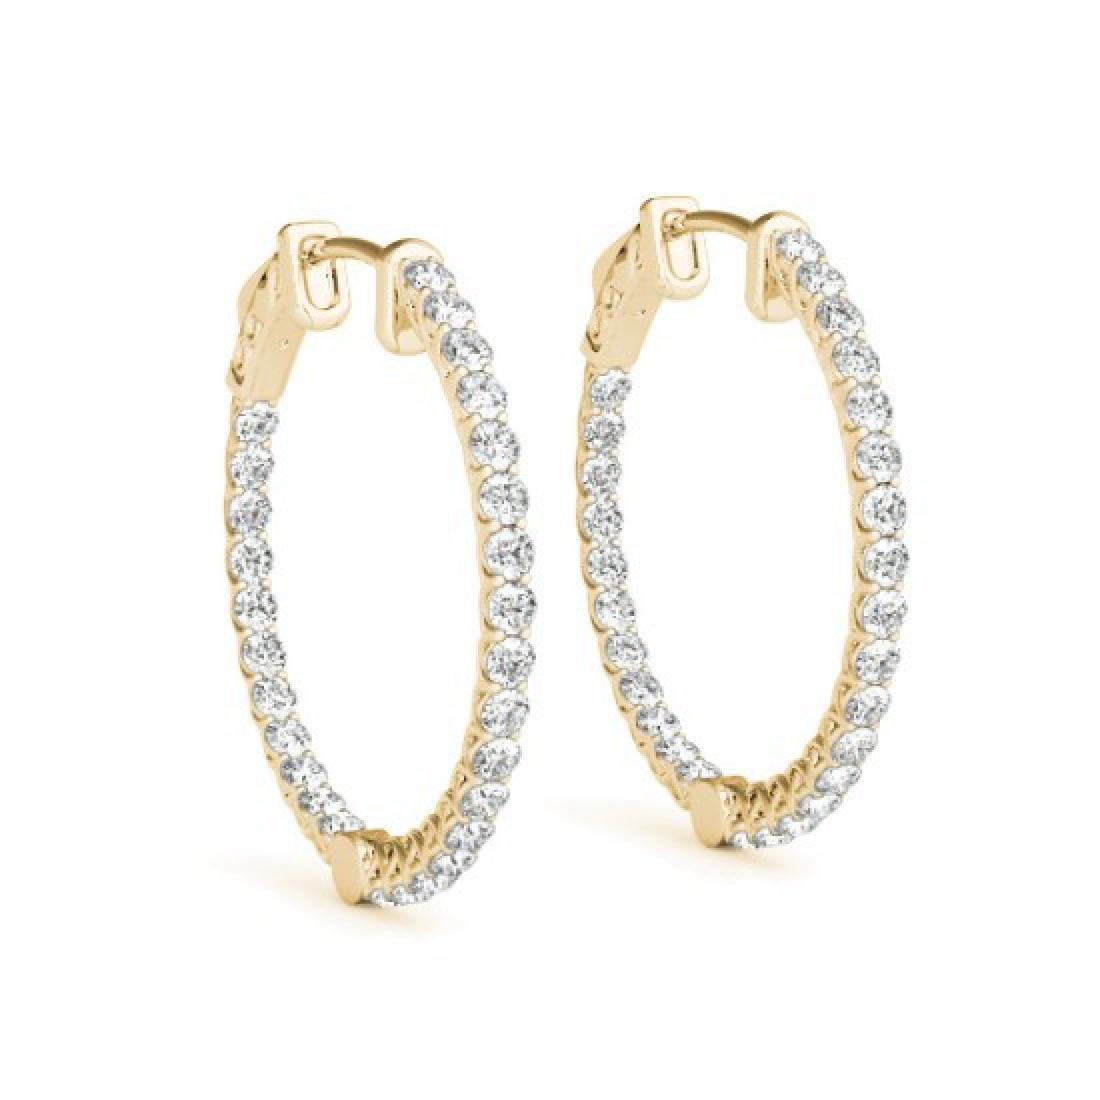 2 CTW Diamond VS/SI Certified 21 Mm Hoop Earrings 14K - 2